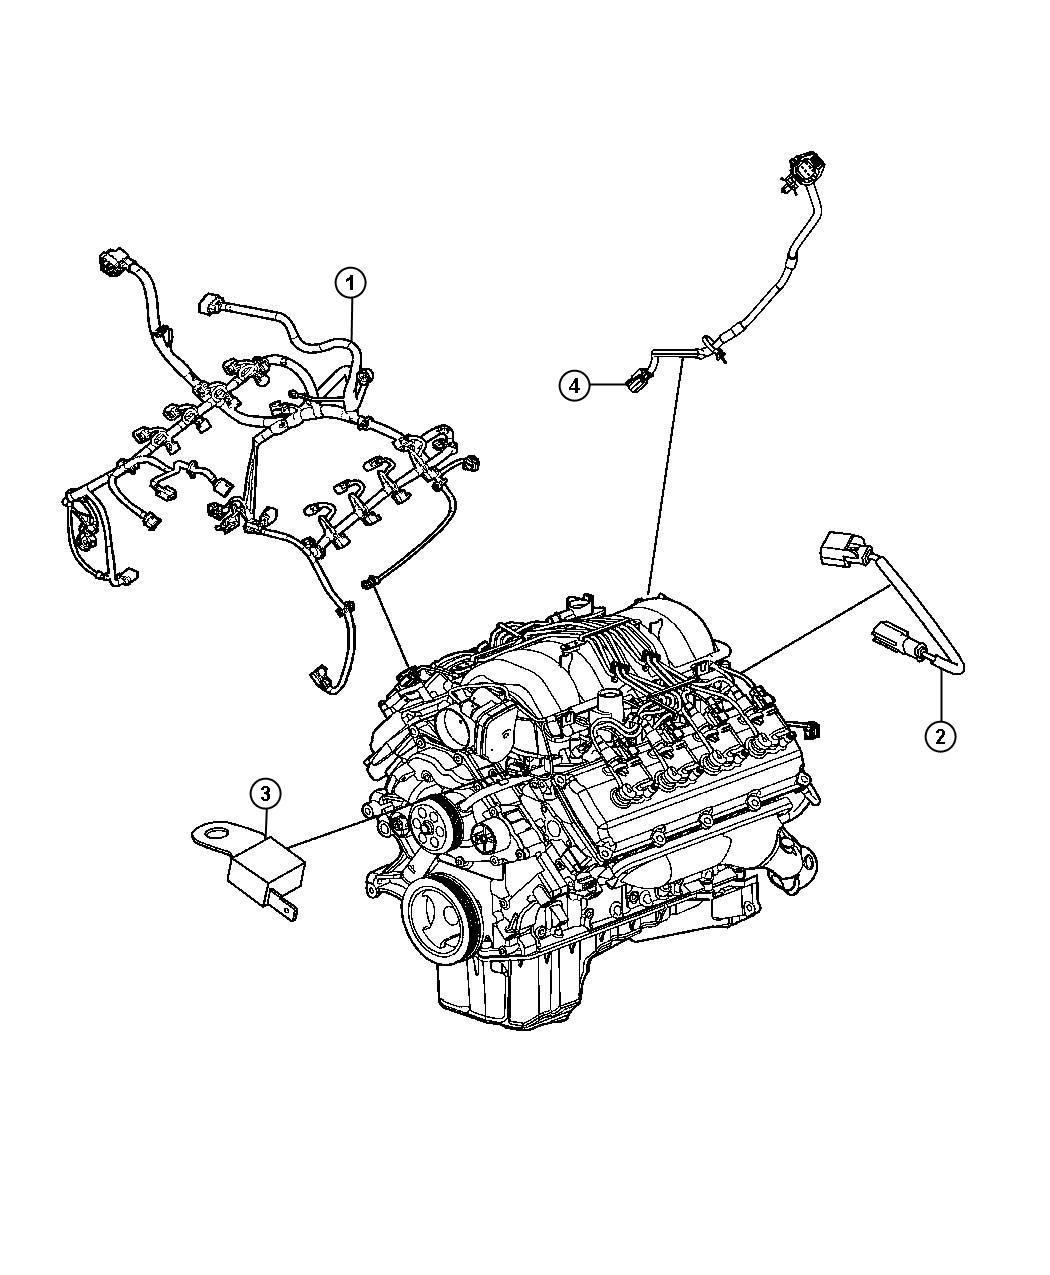 Wiring Diagram 98 Chevy K1500 5 7l Engine: 2012 Dodge Challenger 5.7L V8 HEMI MDS VVT, 5-Speed Auto